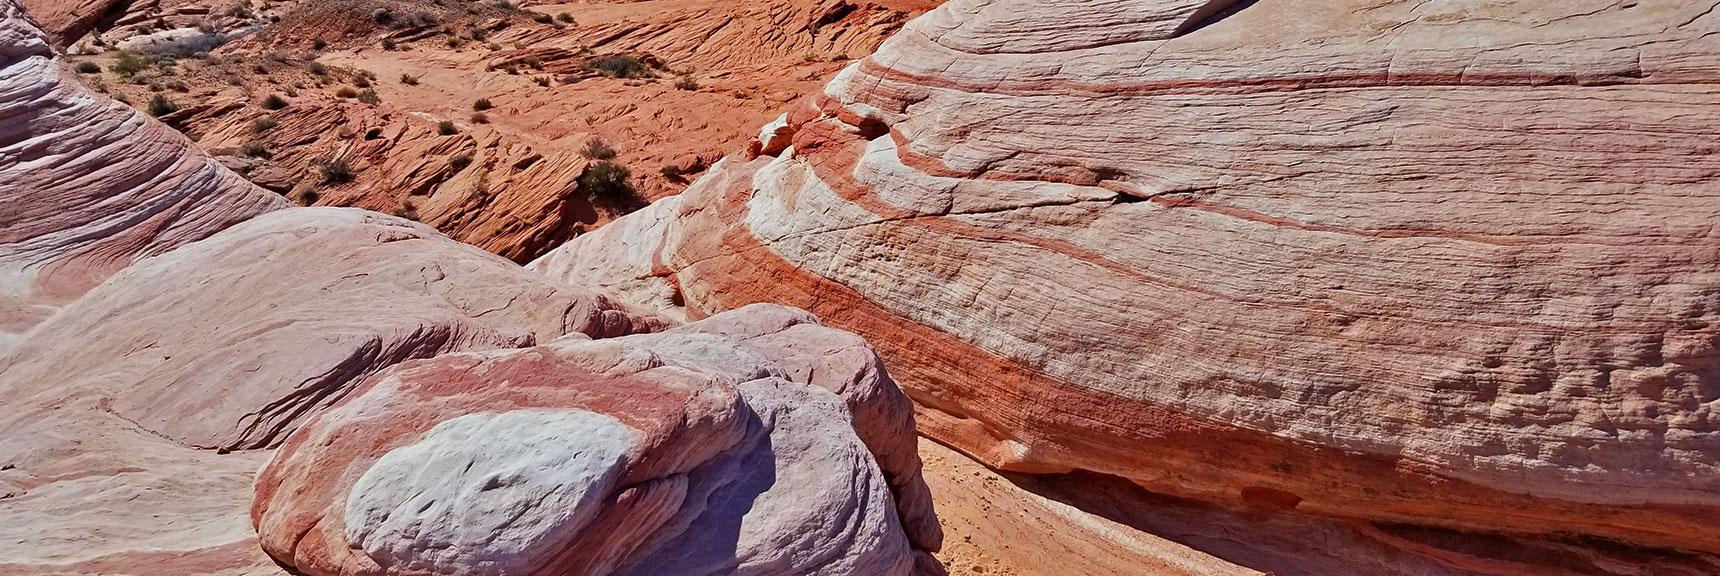 Firewave in Valley of Fire State Park, Nevada, Slide 013